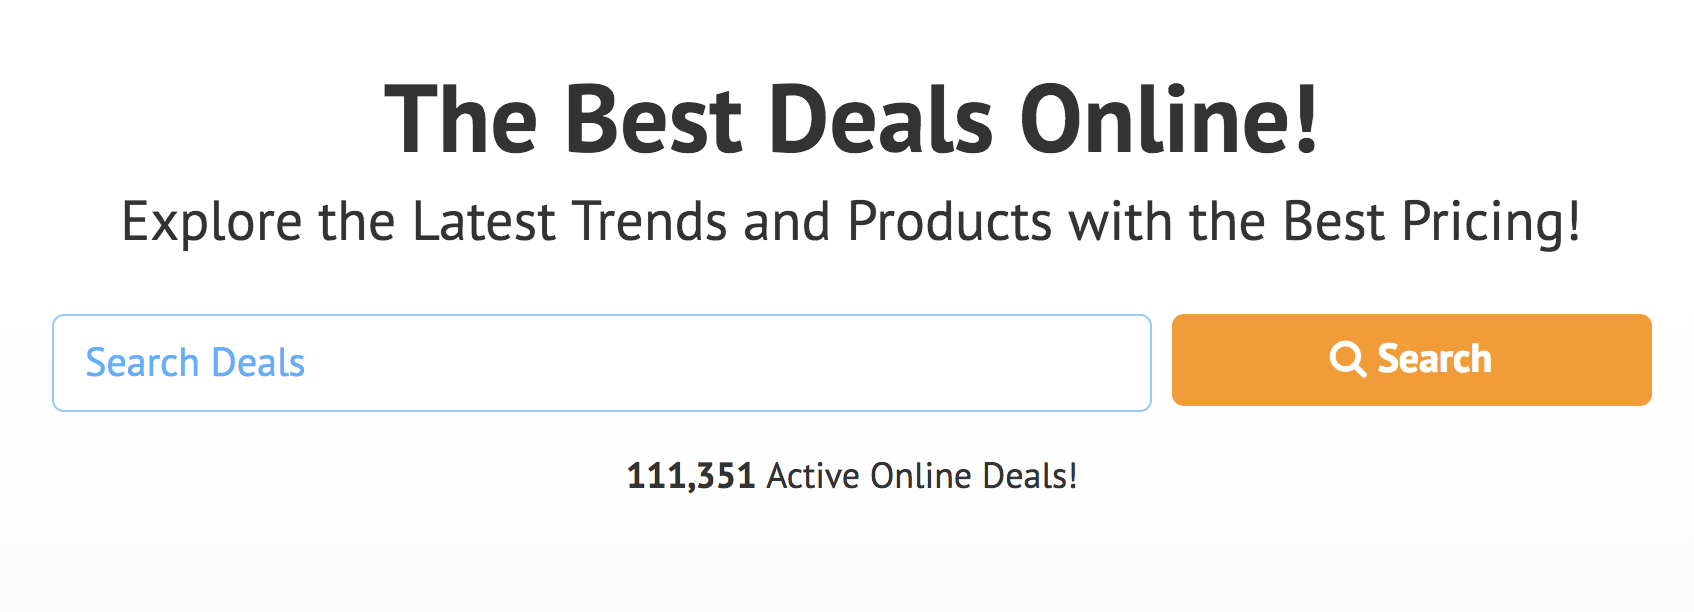 information.com deals